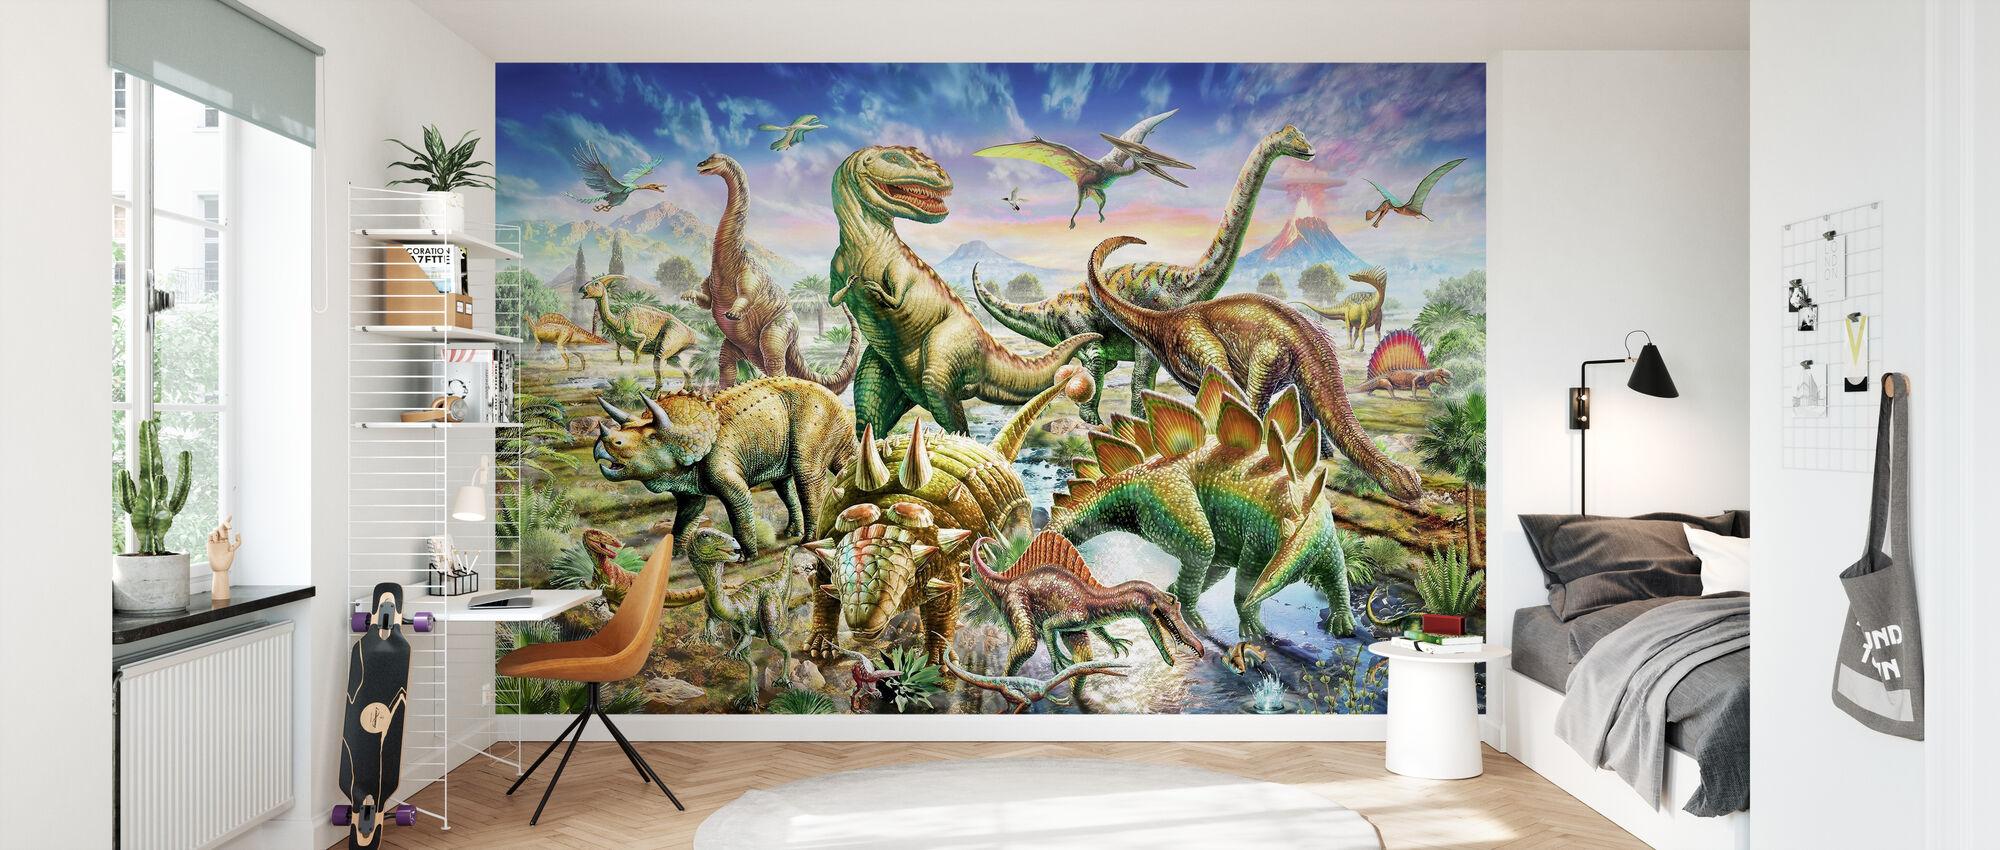 Dinoscene - Wallpaper - Kids Room